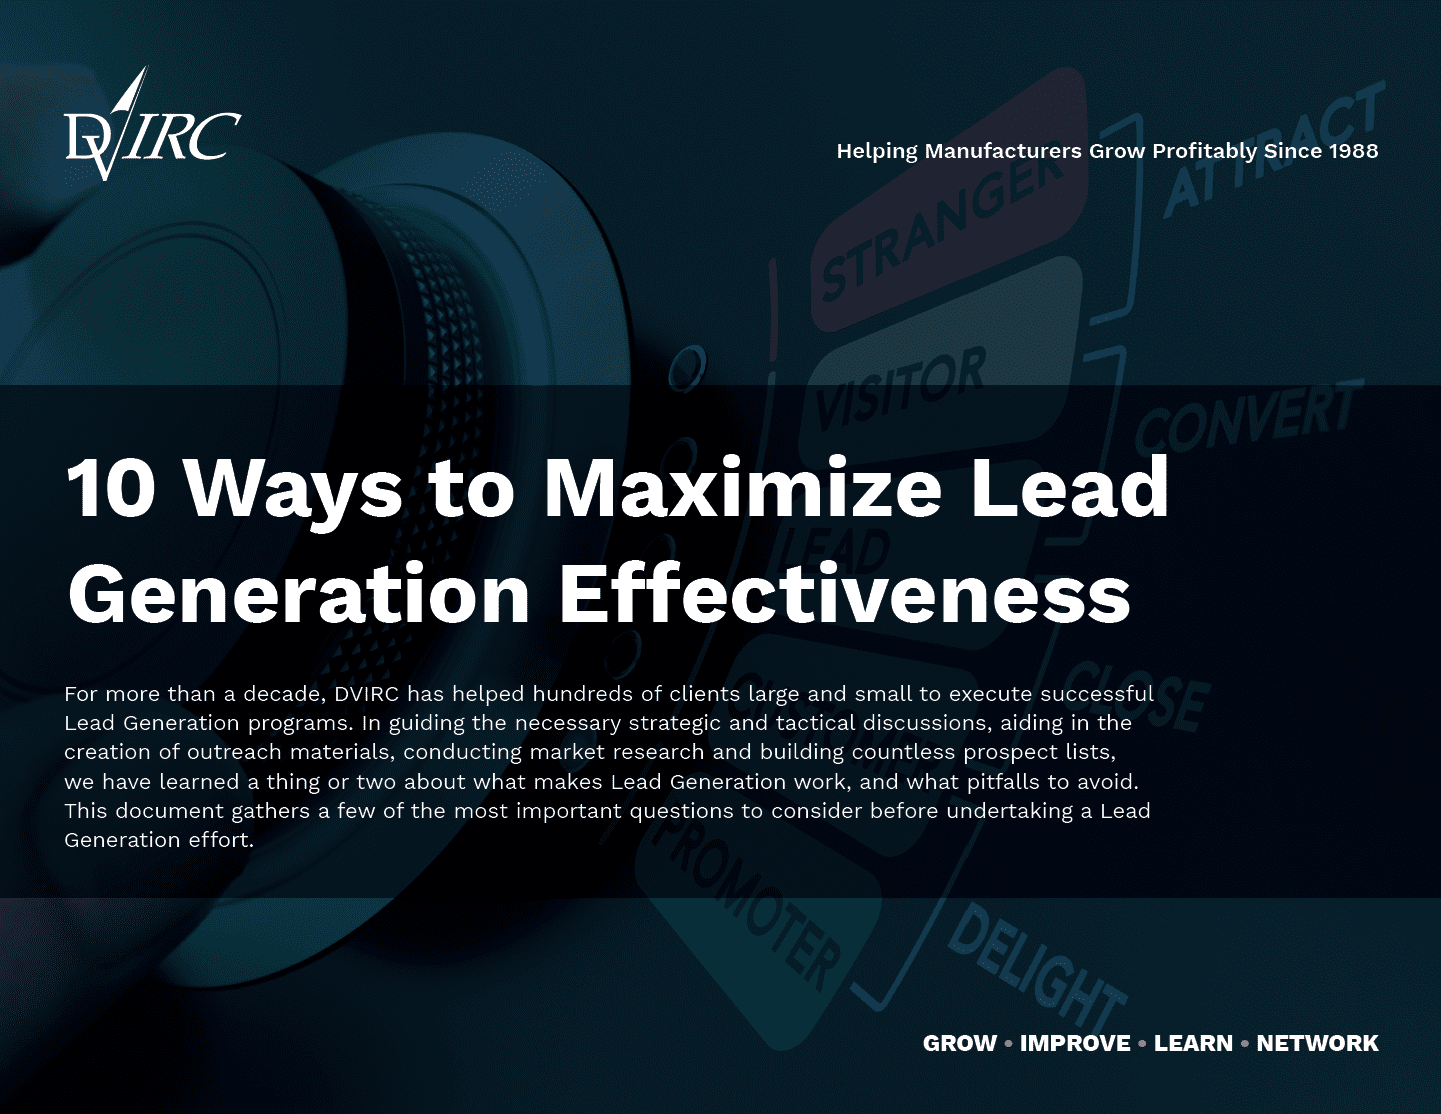 10 Ways to Maximize Lead Generation Effectiveness